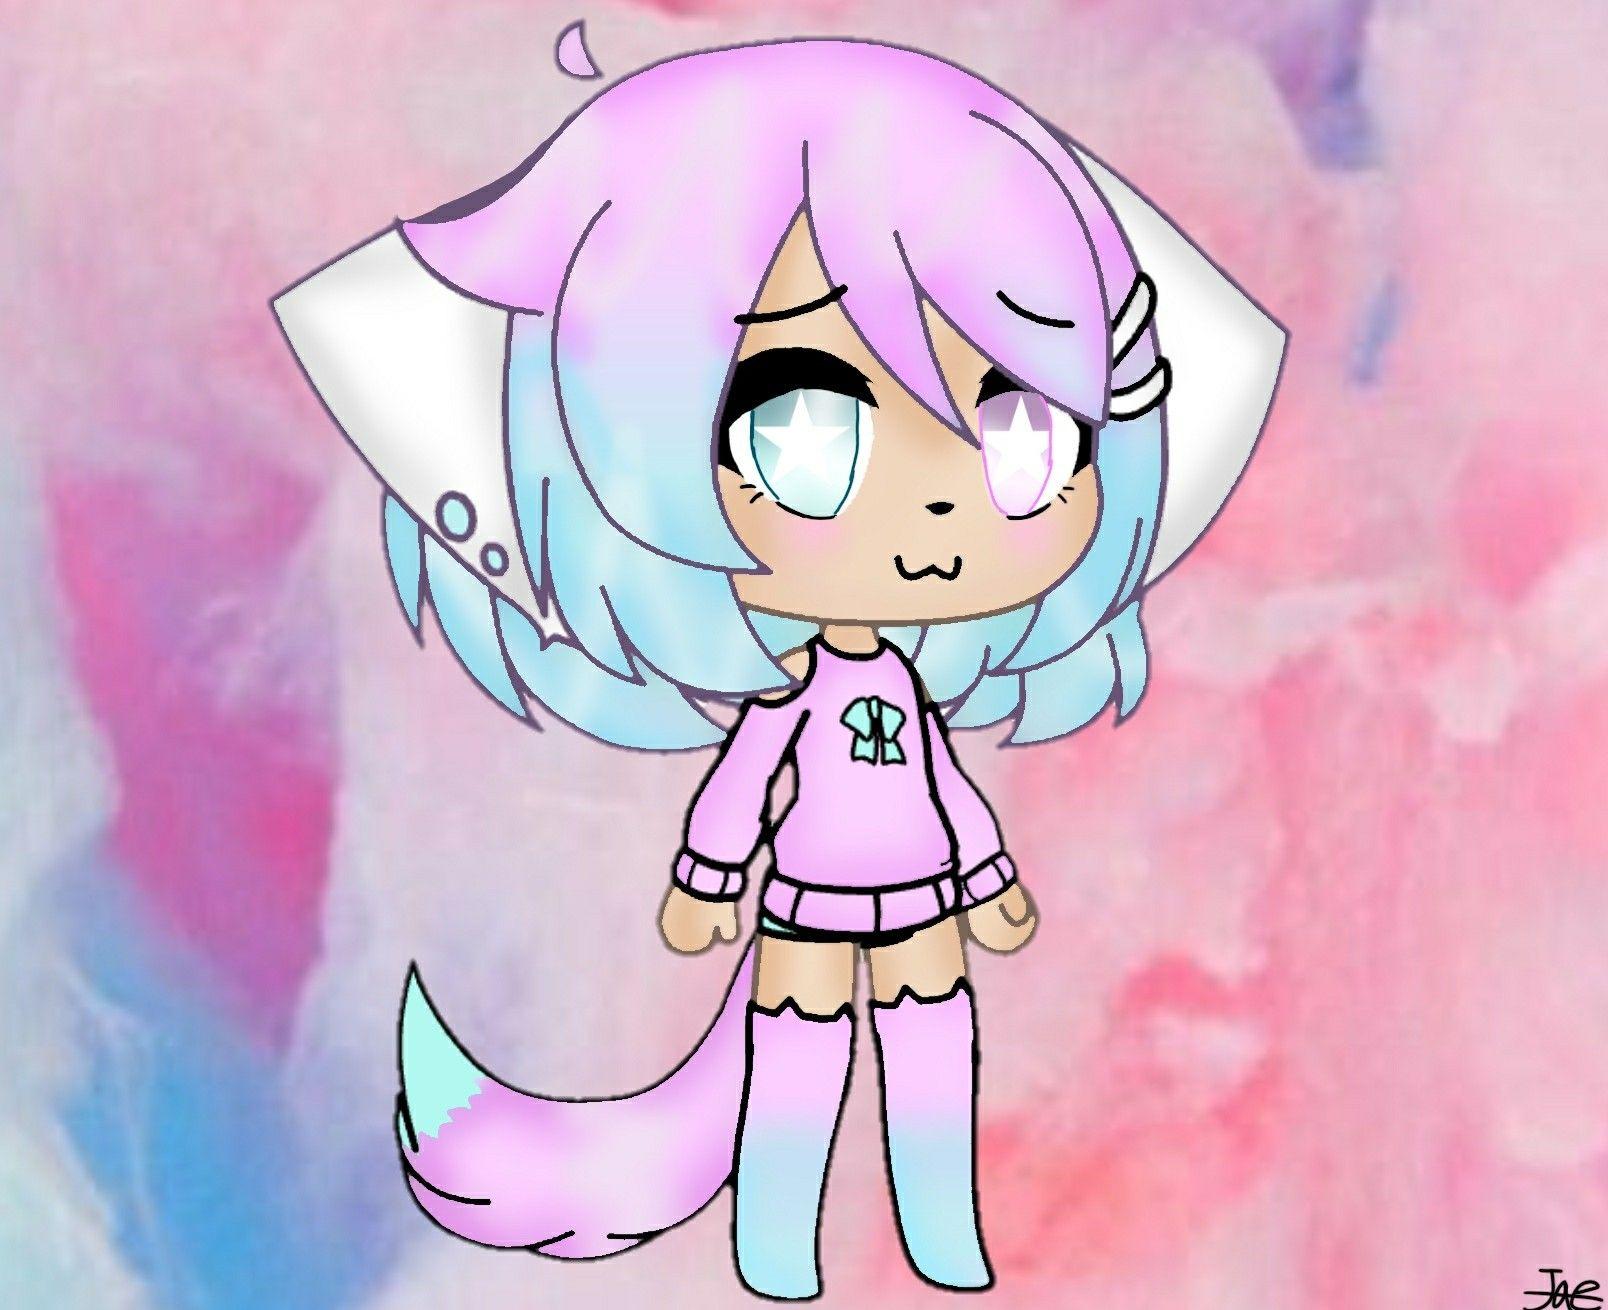 Pin by Courtney Farmer on EVEE Cute anime chibi, Kawaii